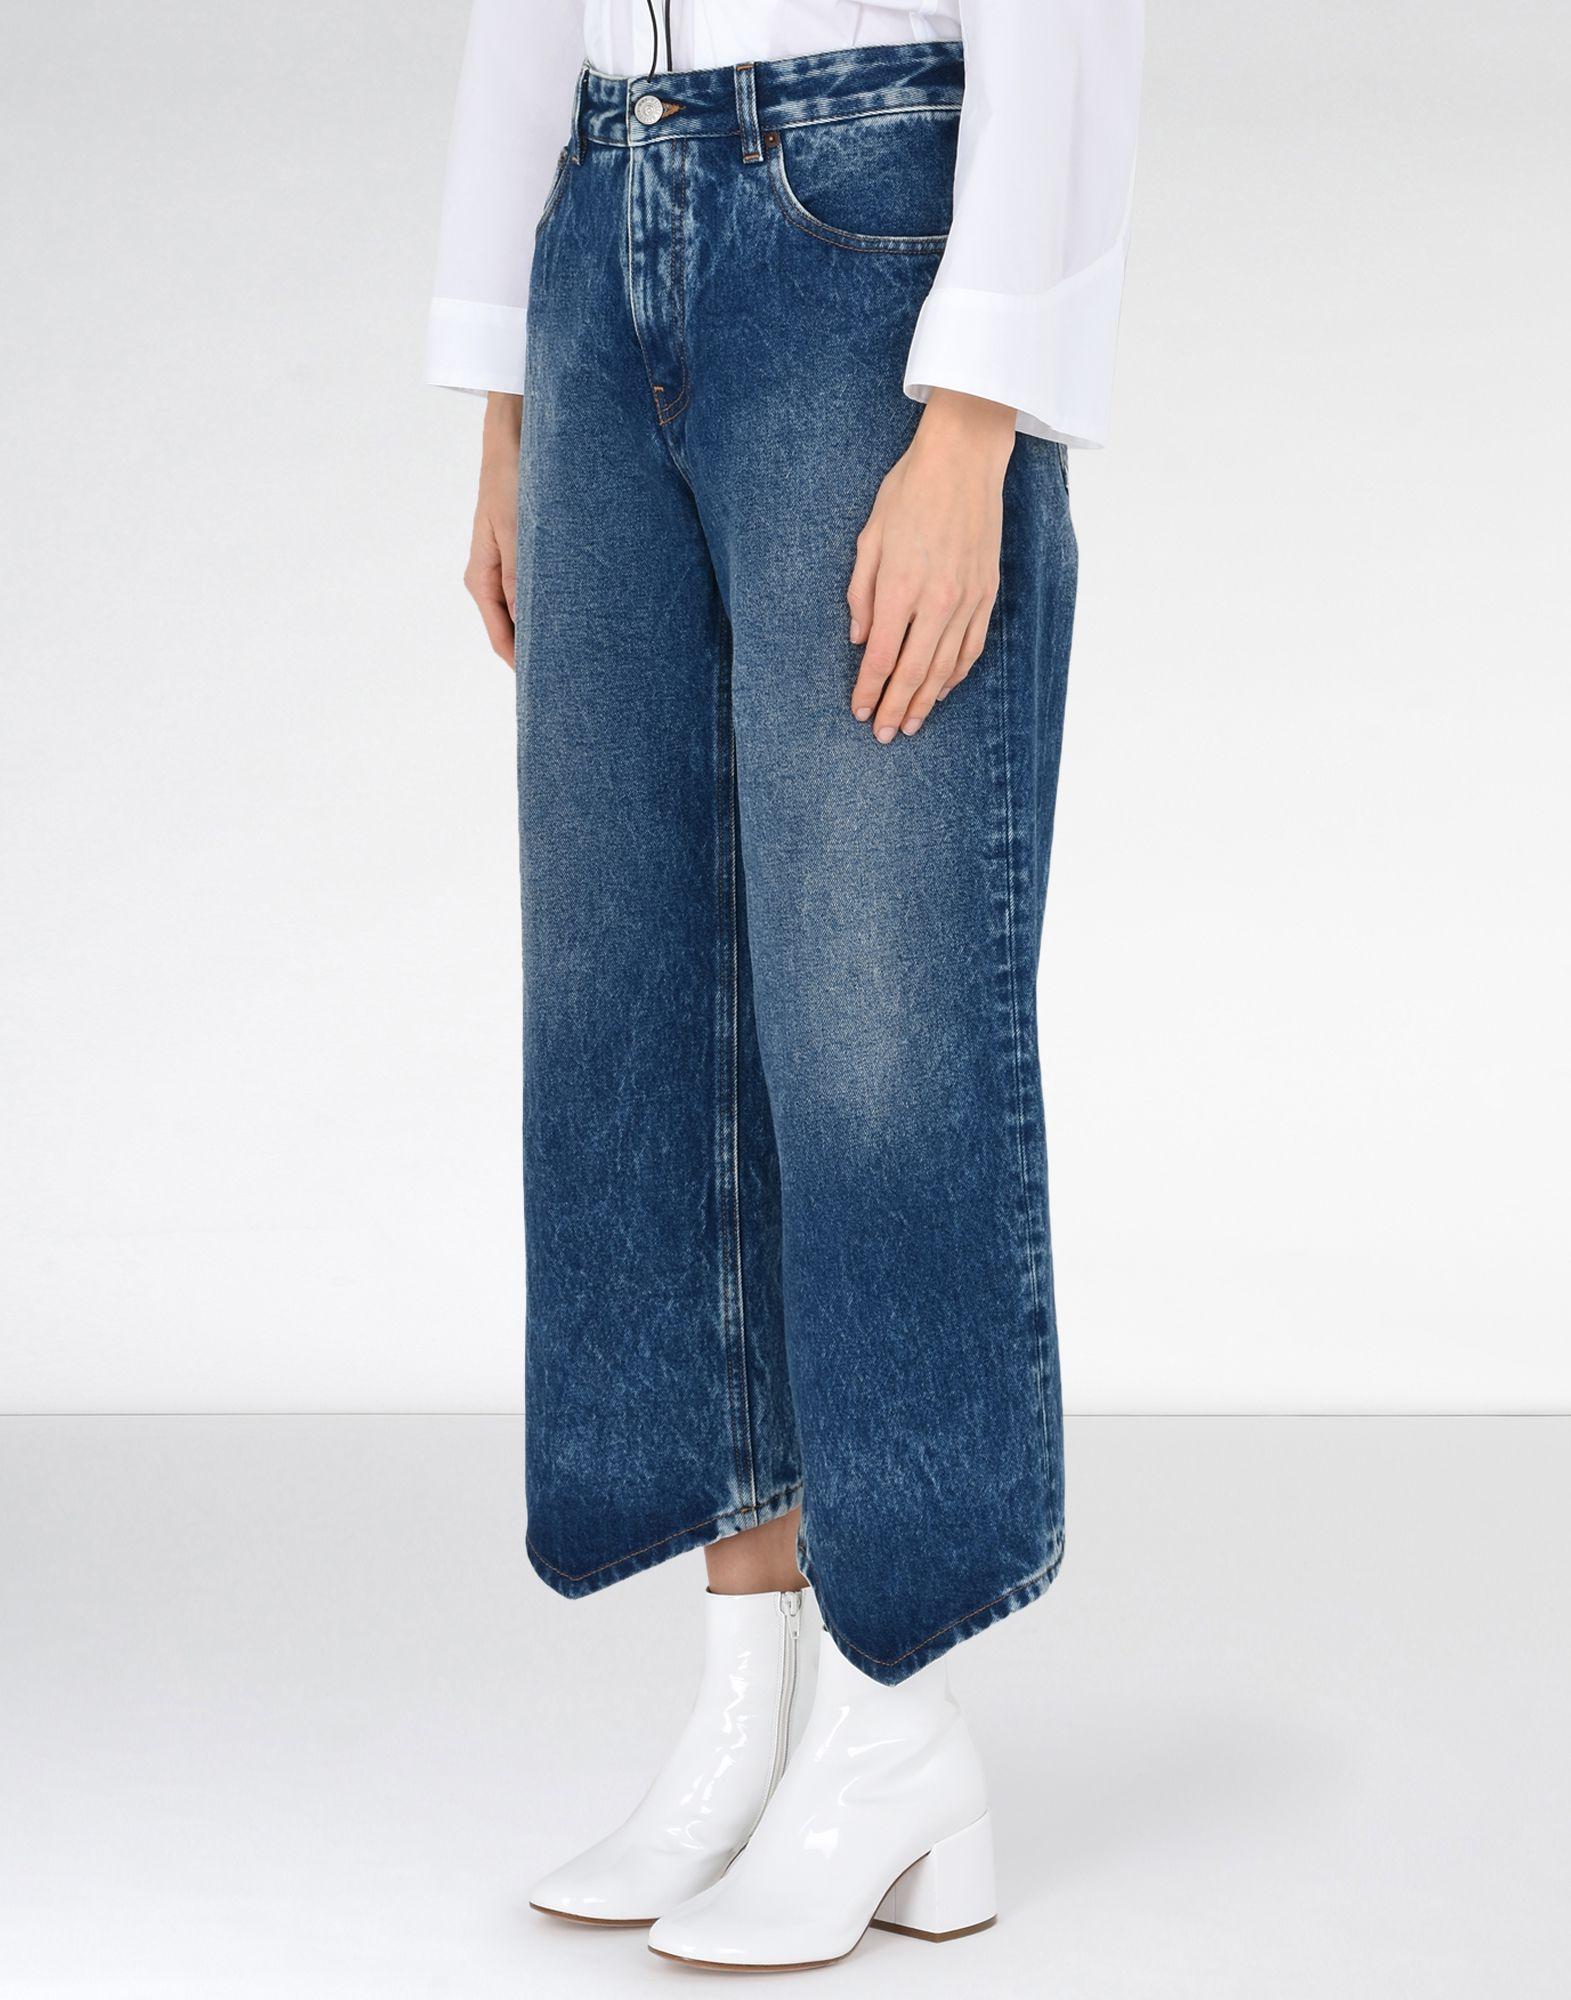 MM6 MAISON MARGIELA Diamond-cut jeans Jeans Woman f